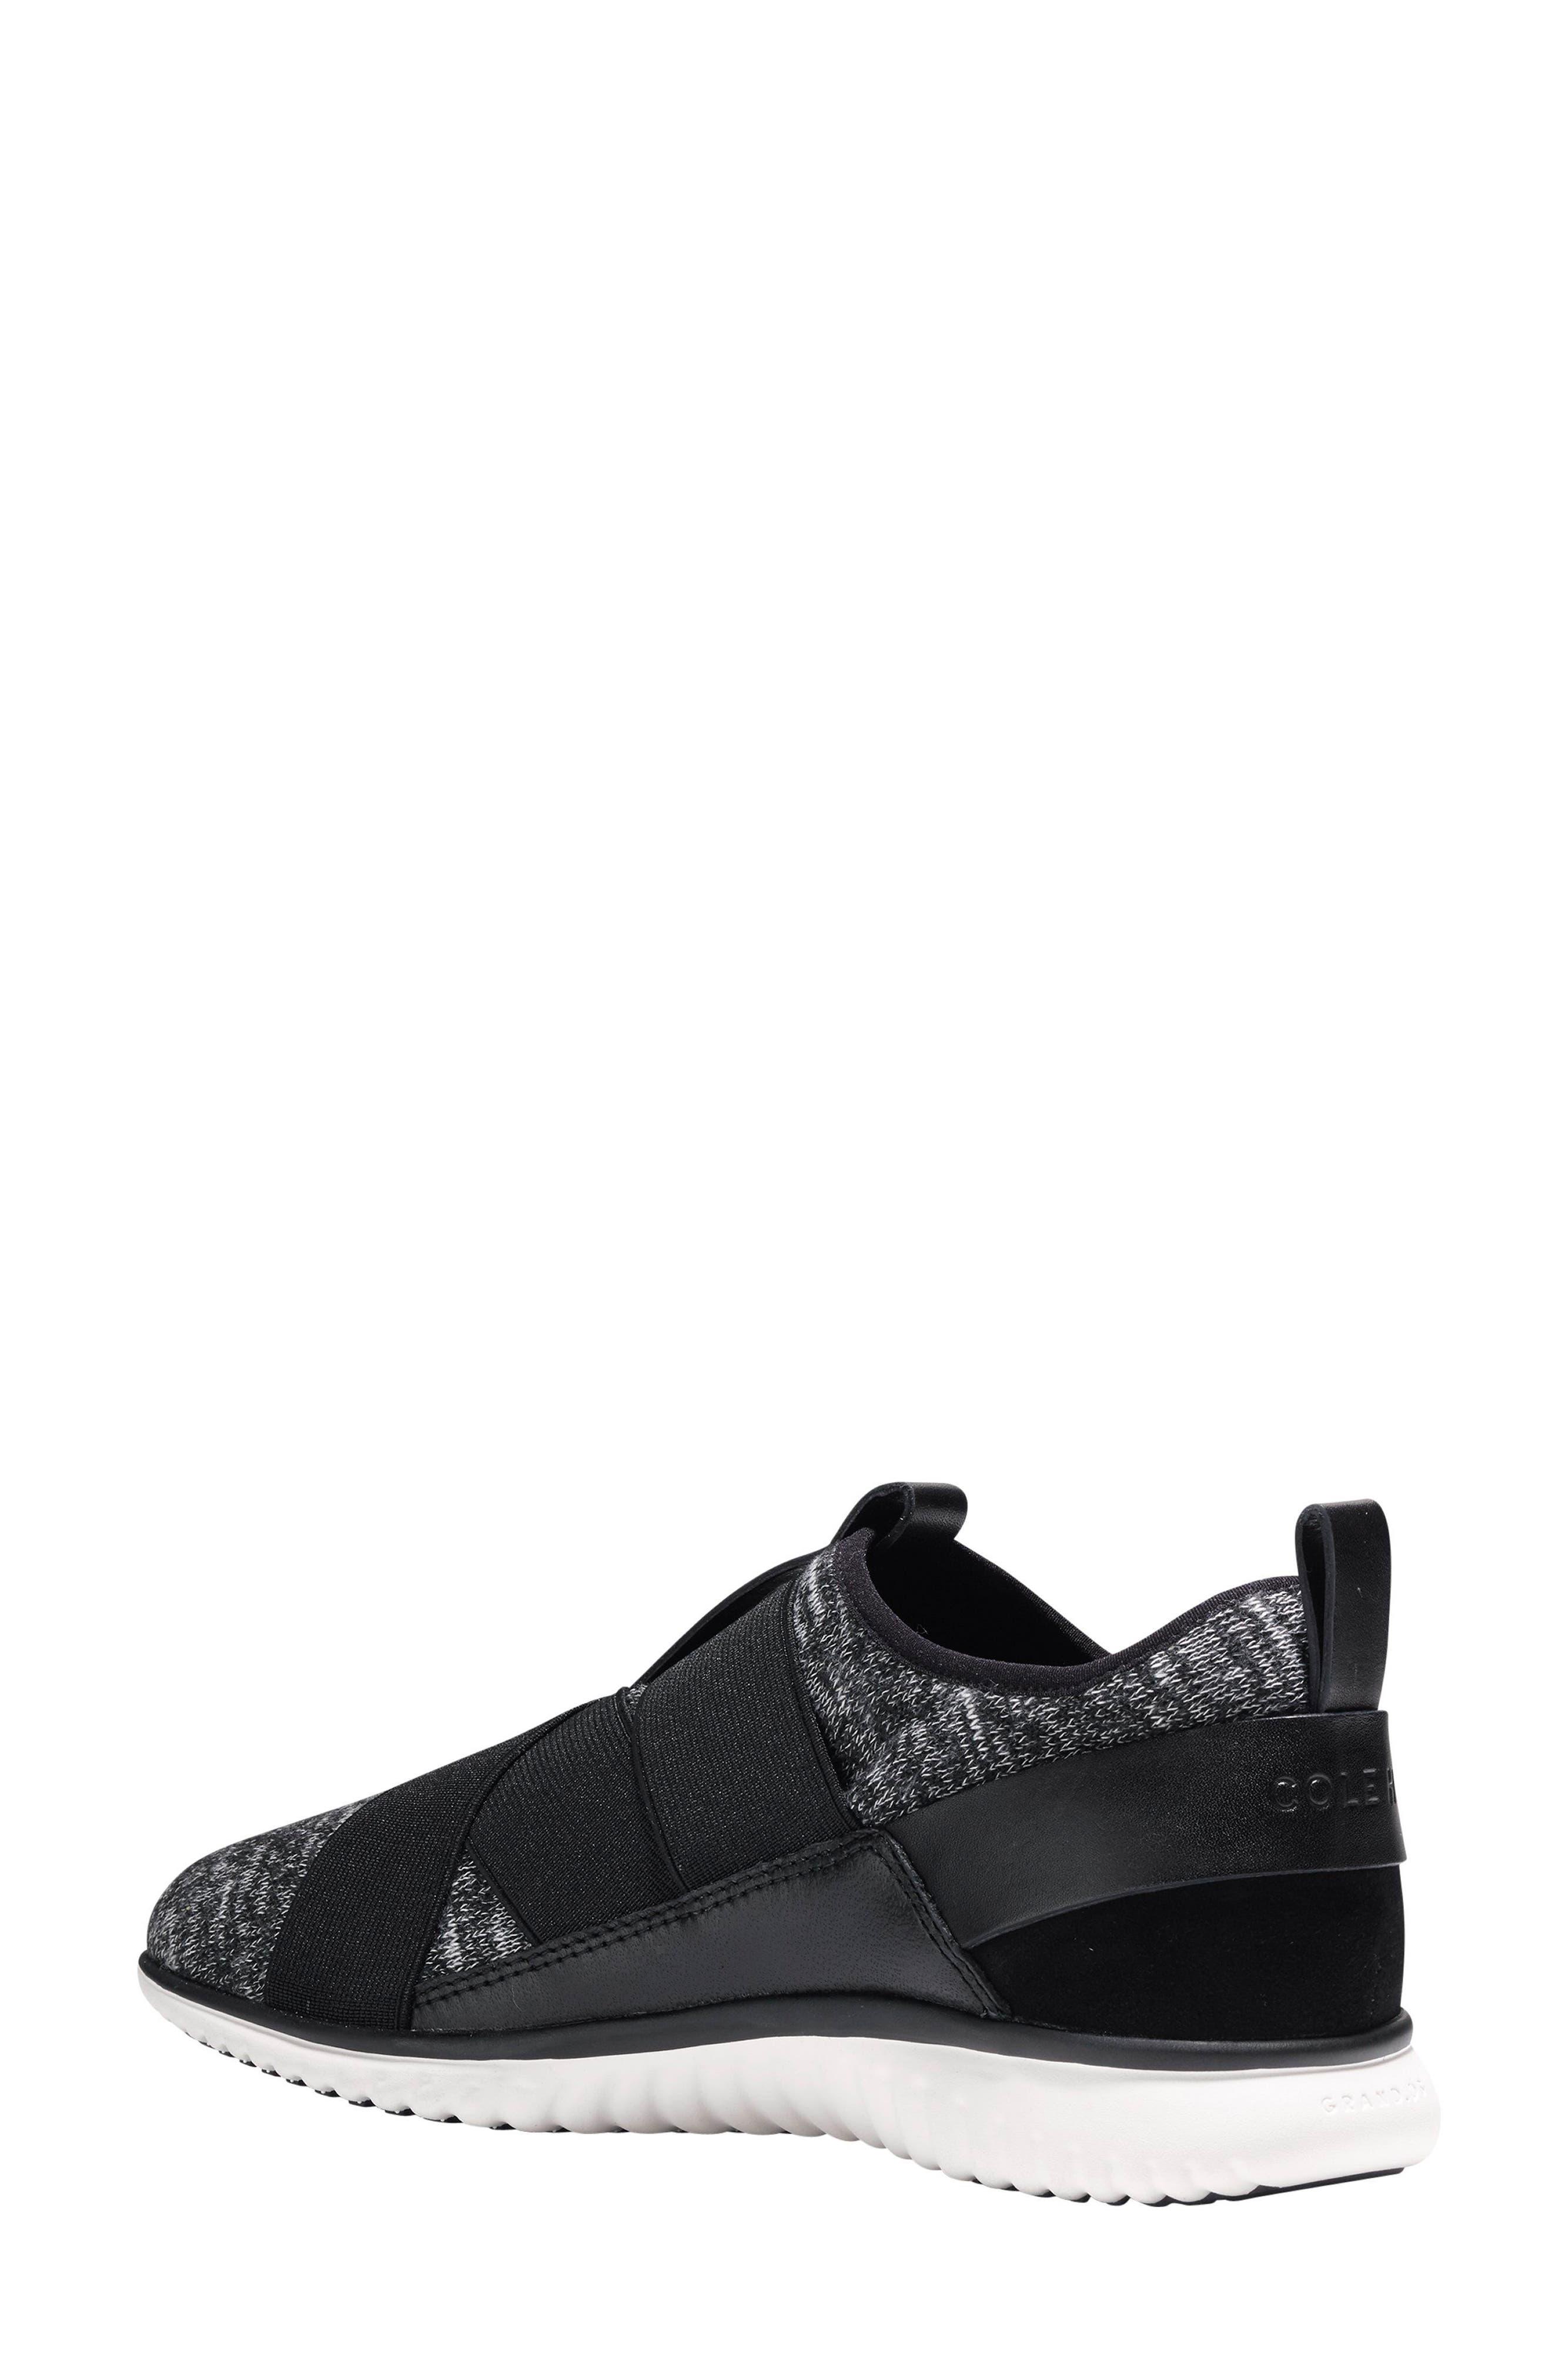 'StudioGrand' Sneaker,                             Alternate thumbnail 2, color,                             002